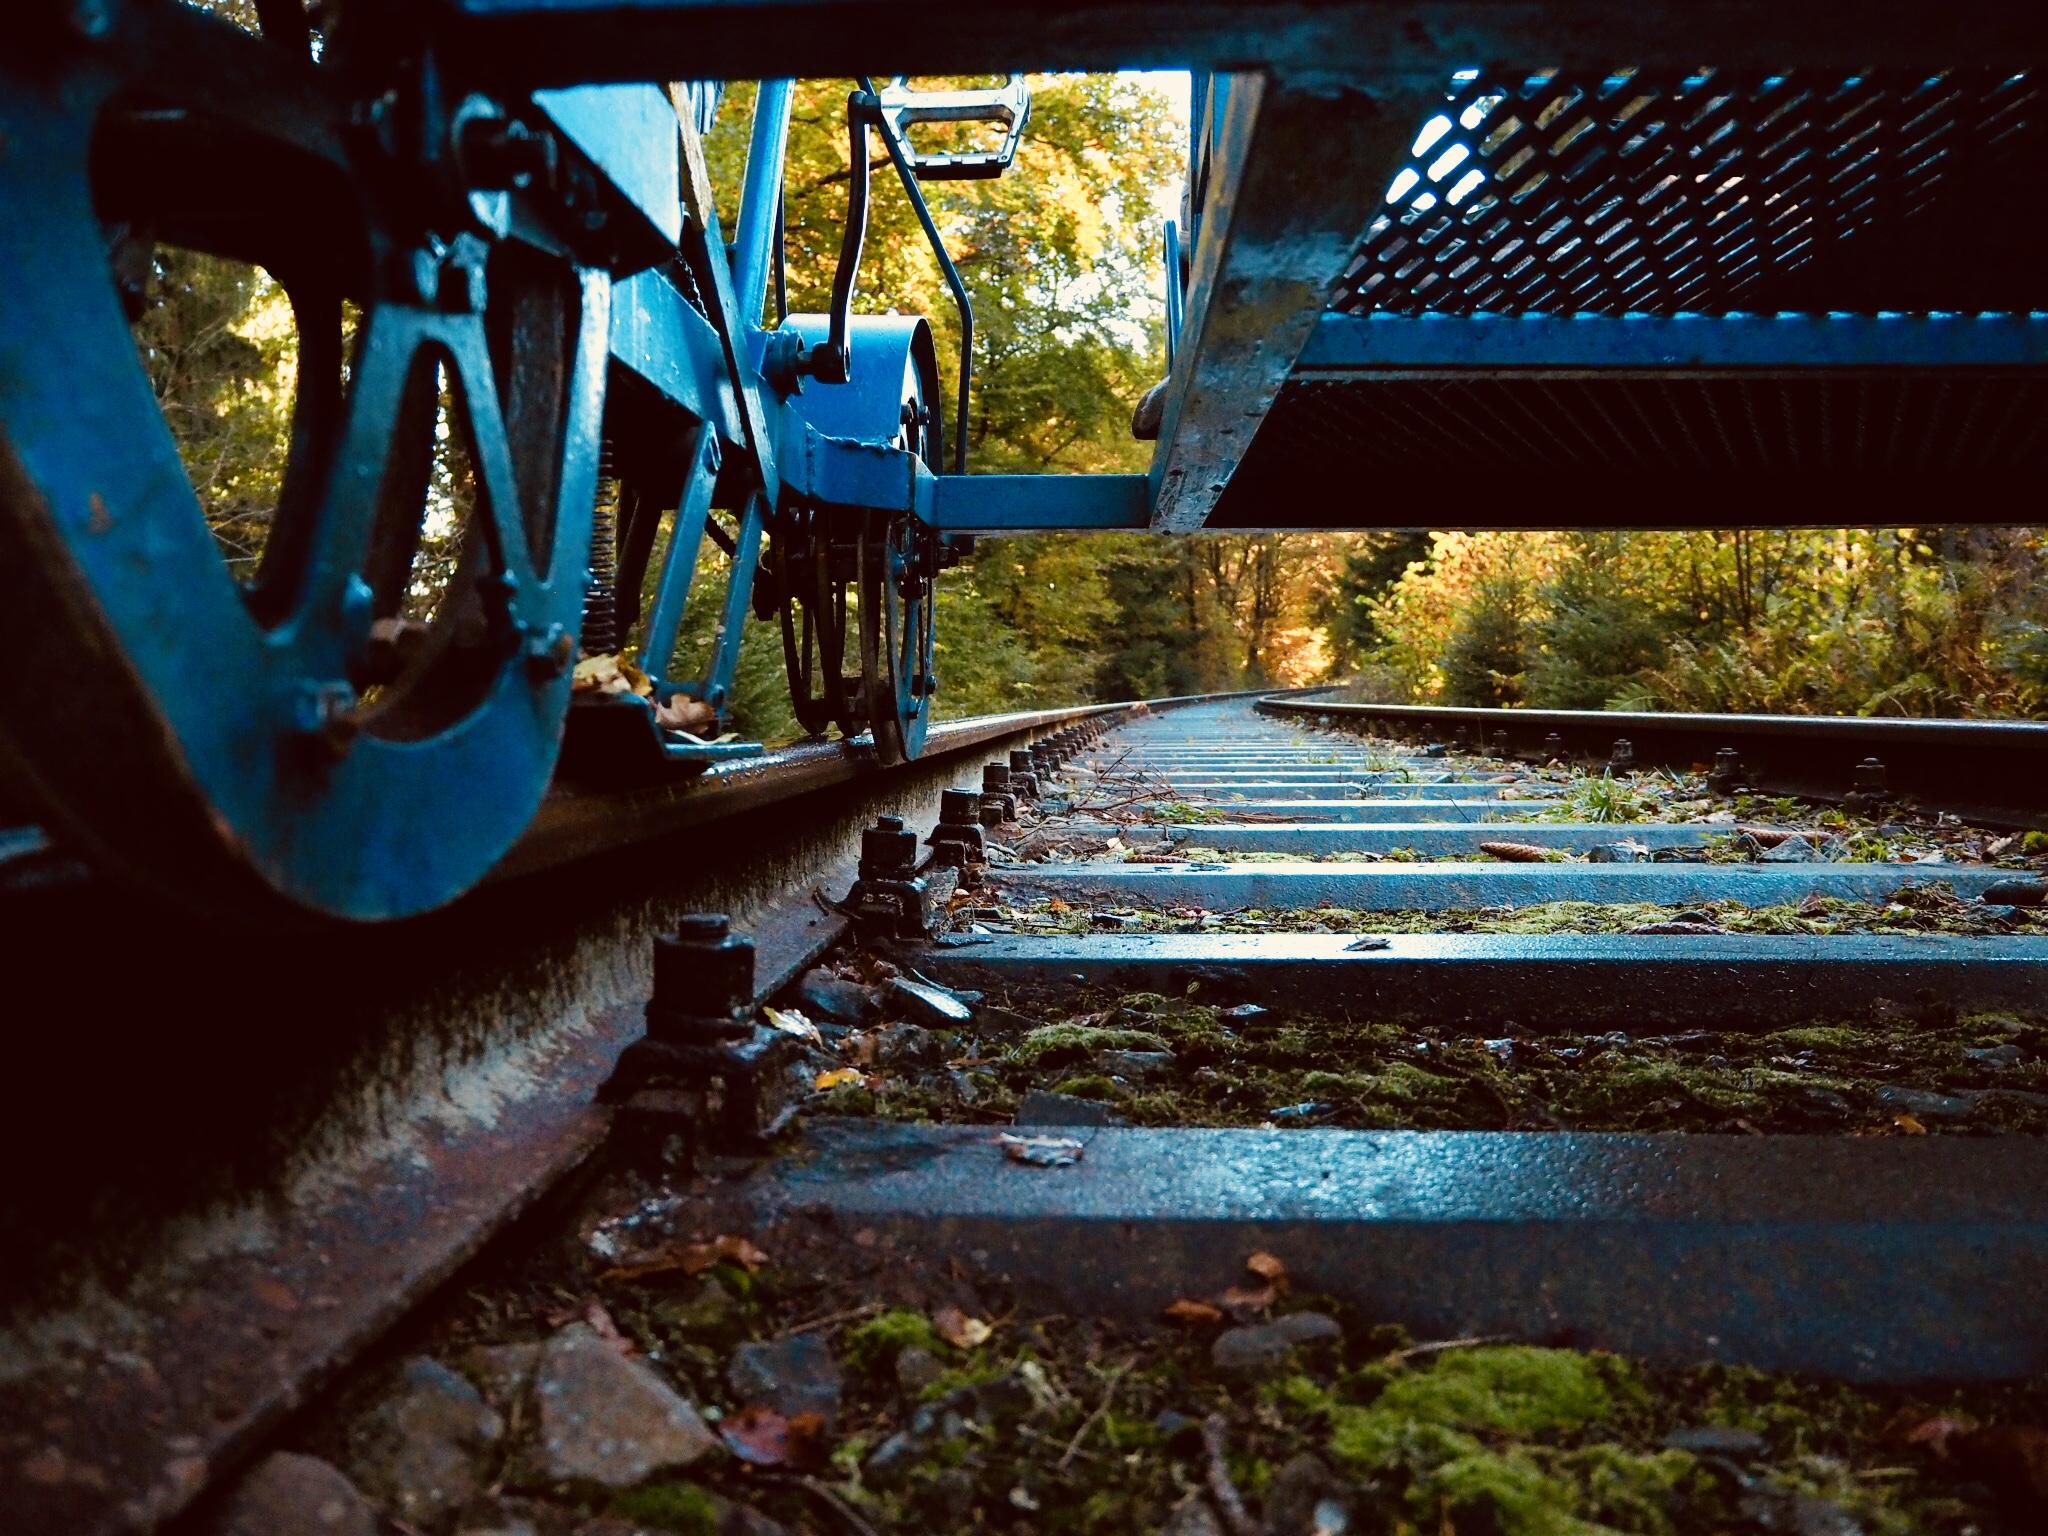 Draisinenbahn Sauerland